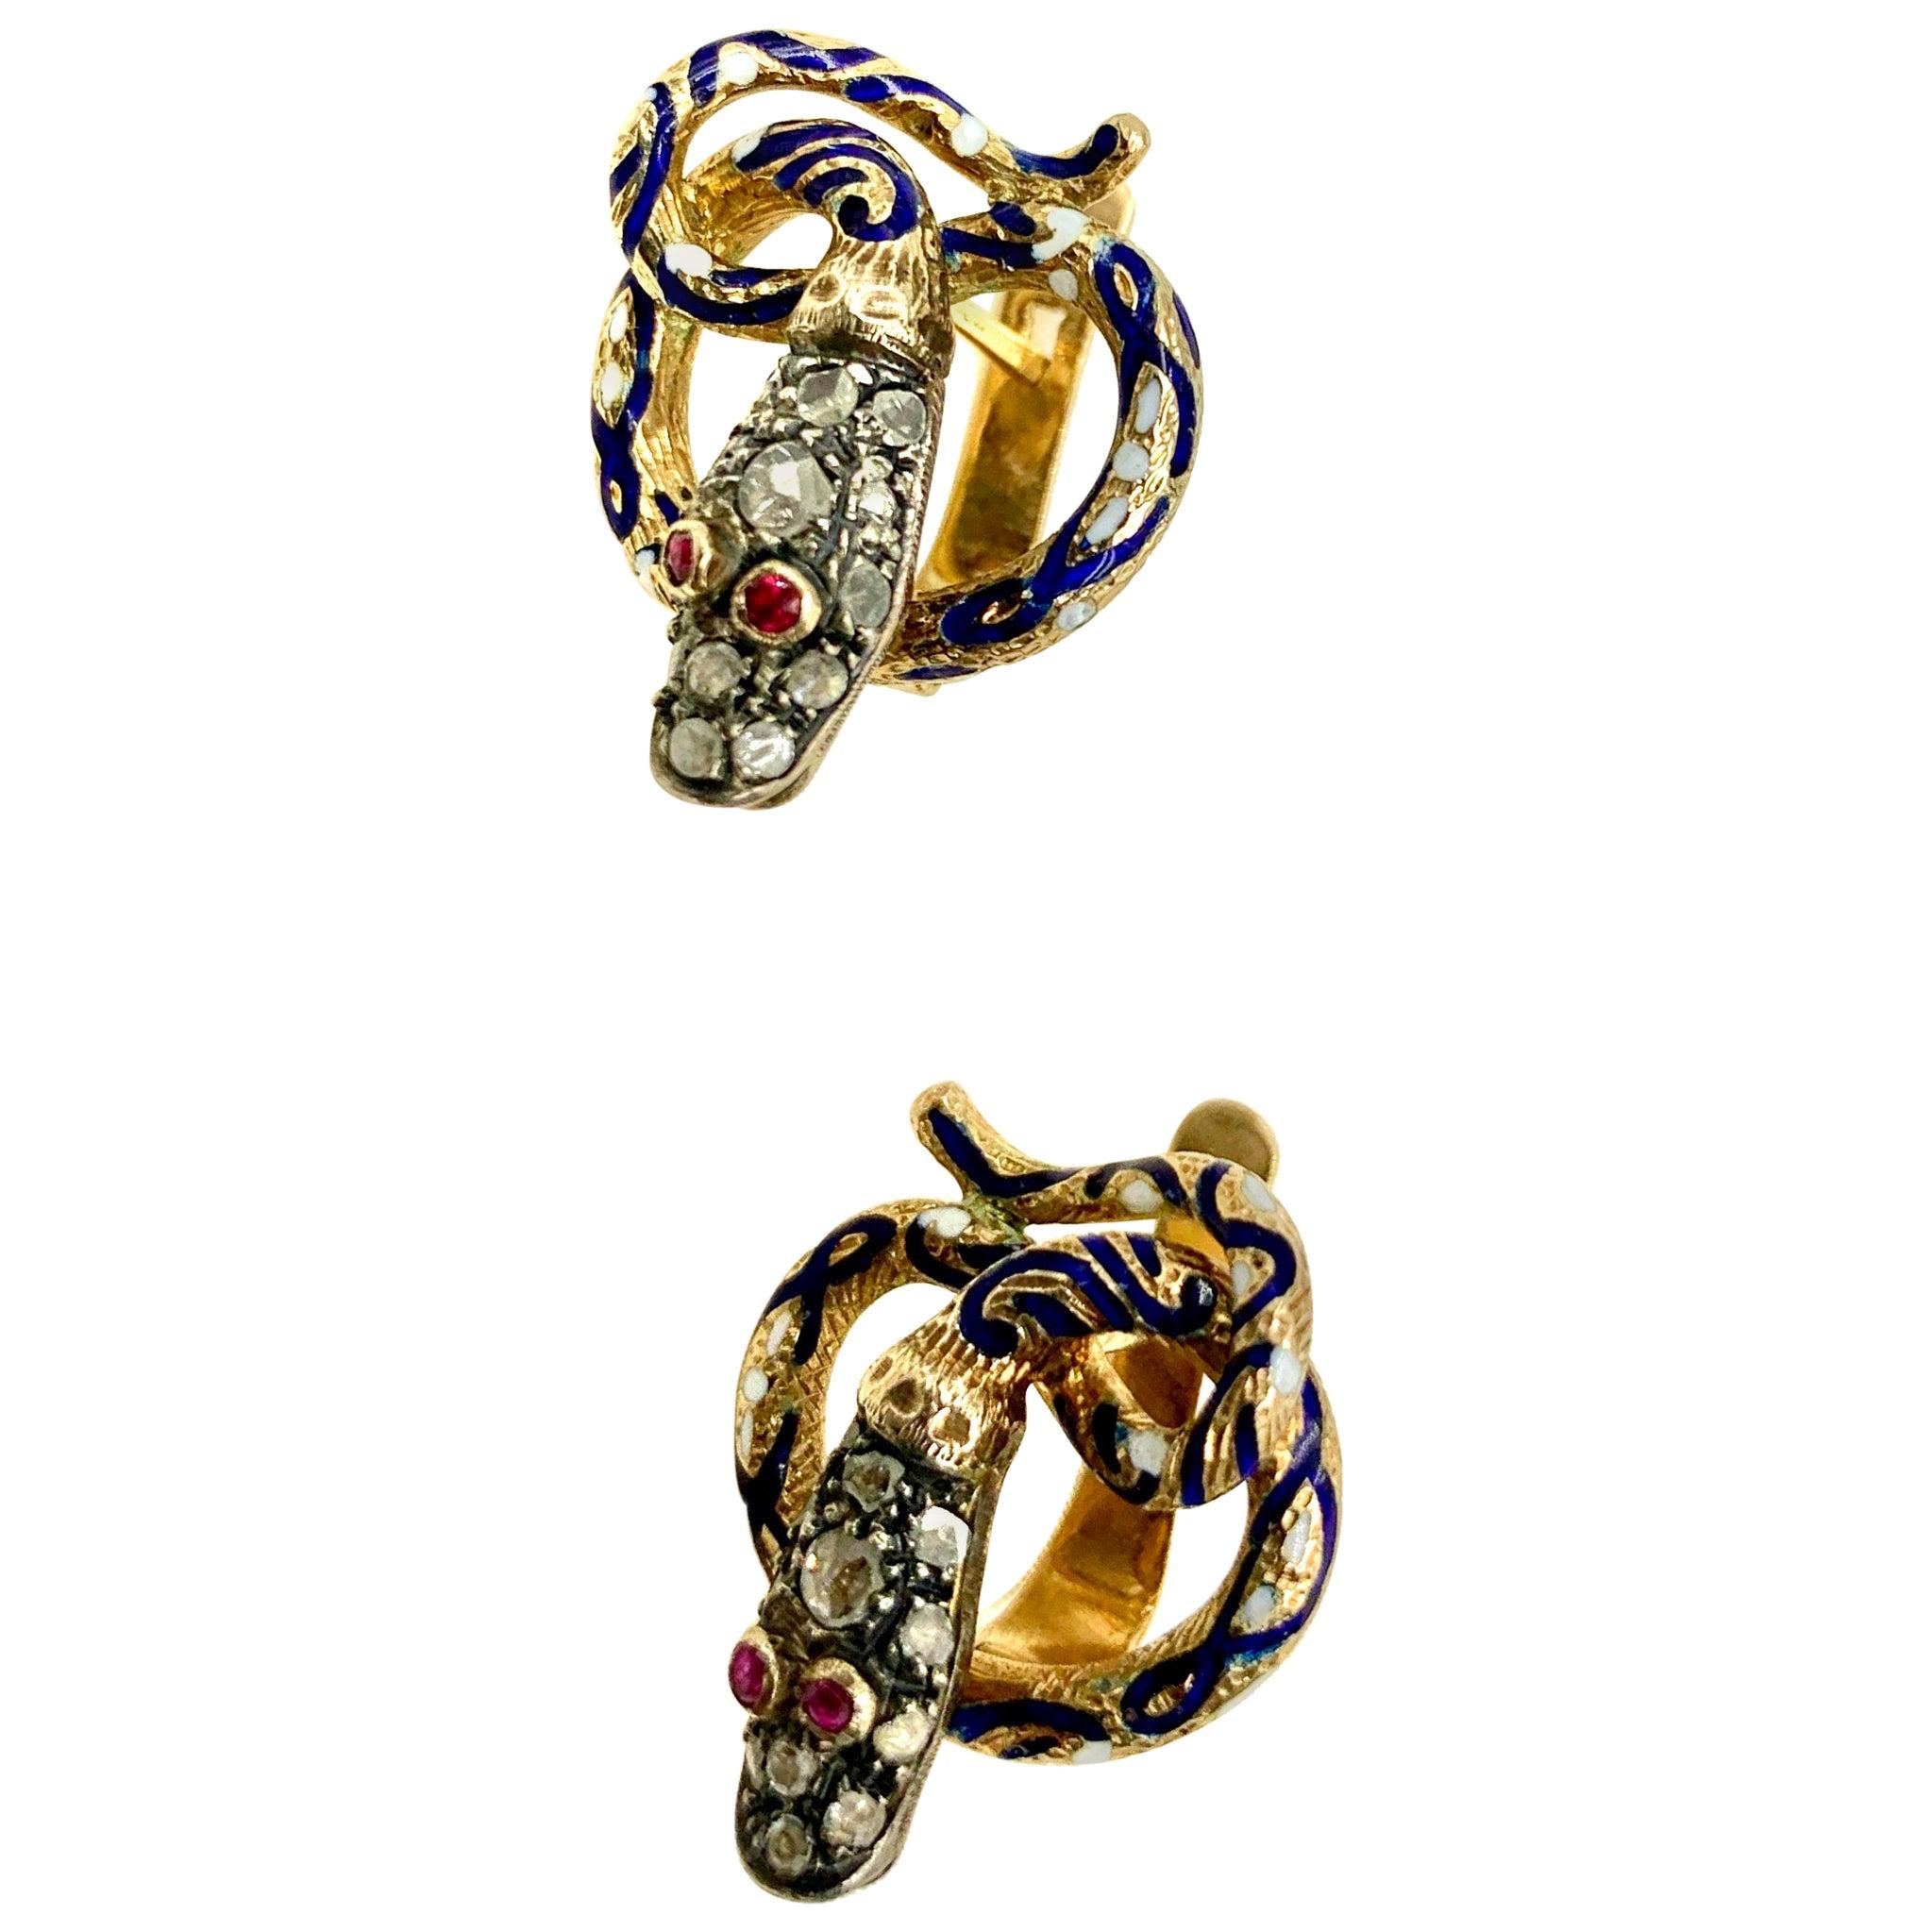 Antique Snake Earrings, Diamonds, Rubies, Enamel and 14 Karat Yellow Gold